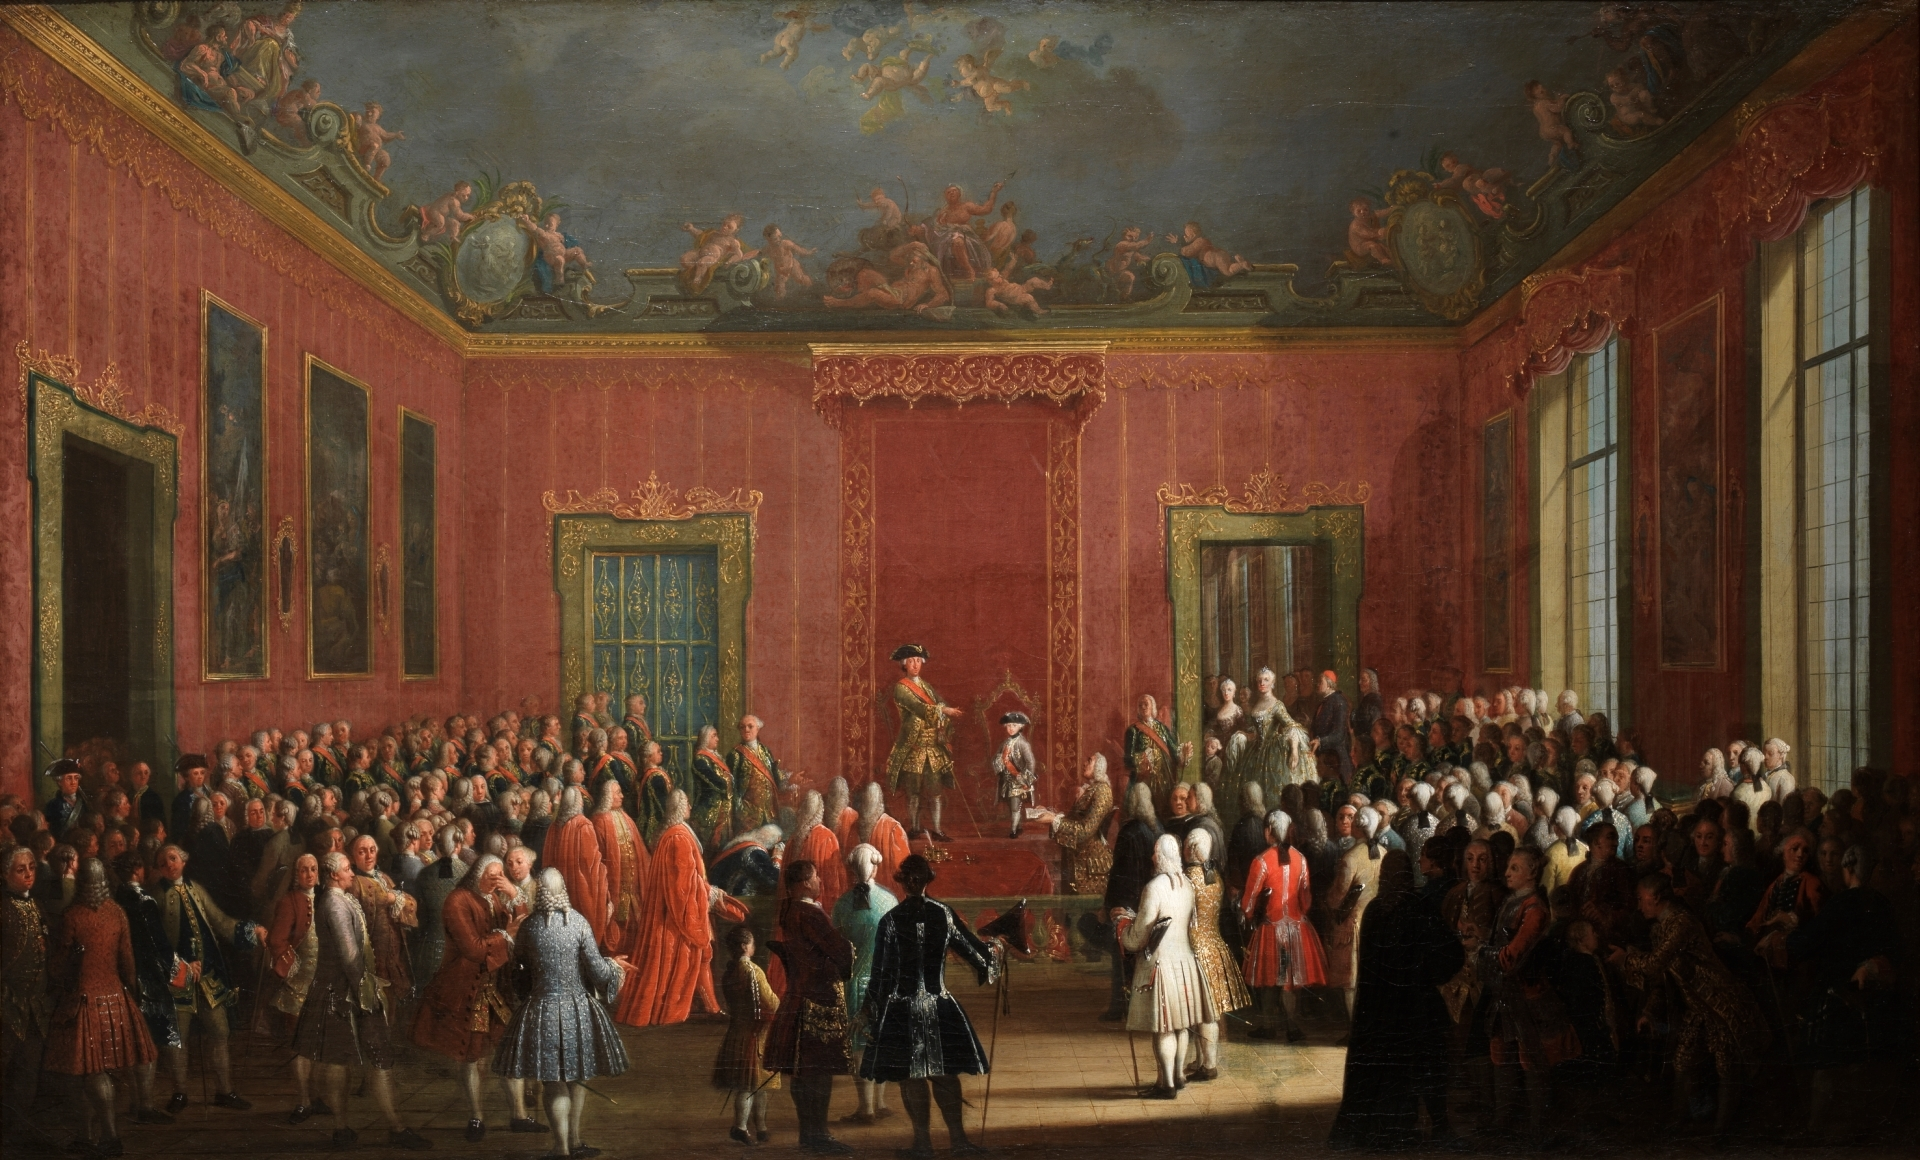 Abdicació de Carlos III (1759), obra de Antonio Joli. Carlos III entrega la corona de Nàpols a Ferran I. Font Museo del Prado